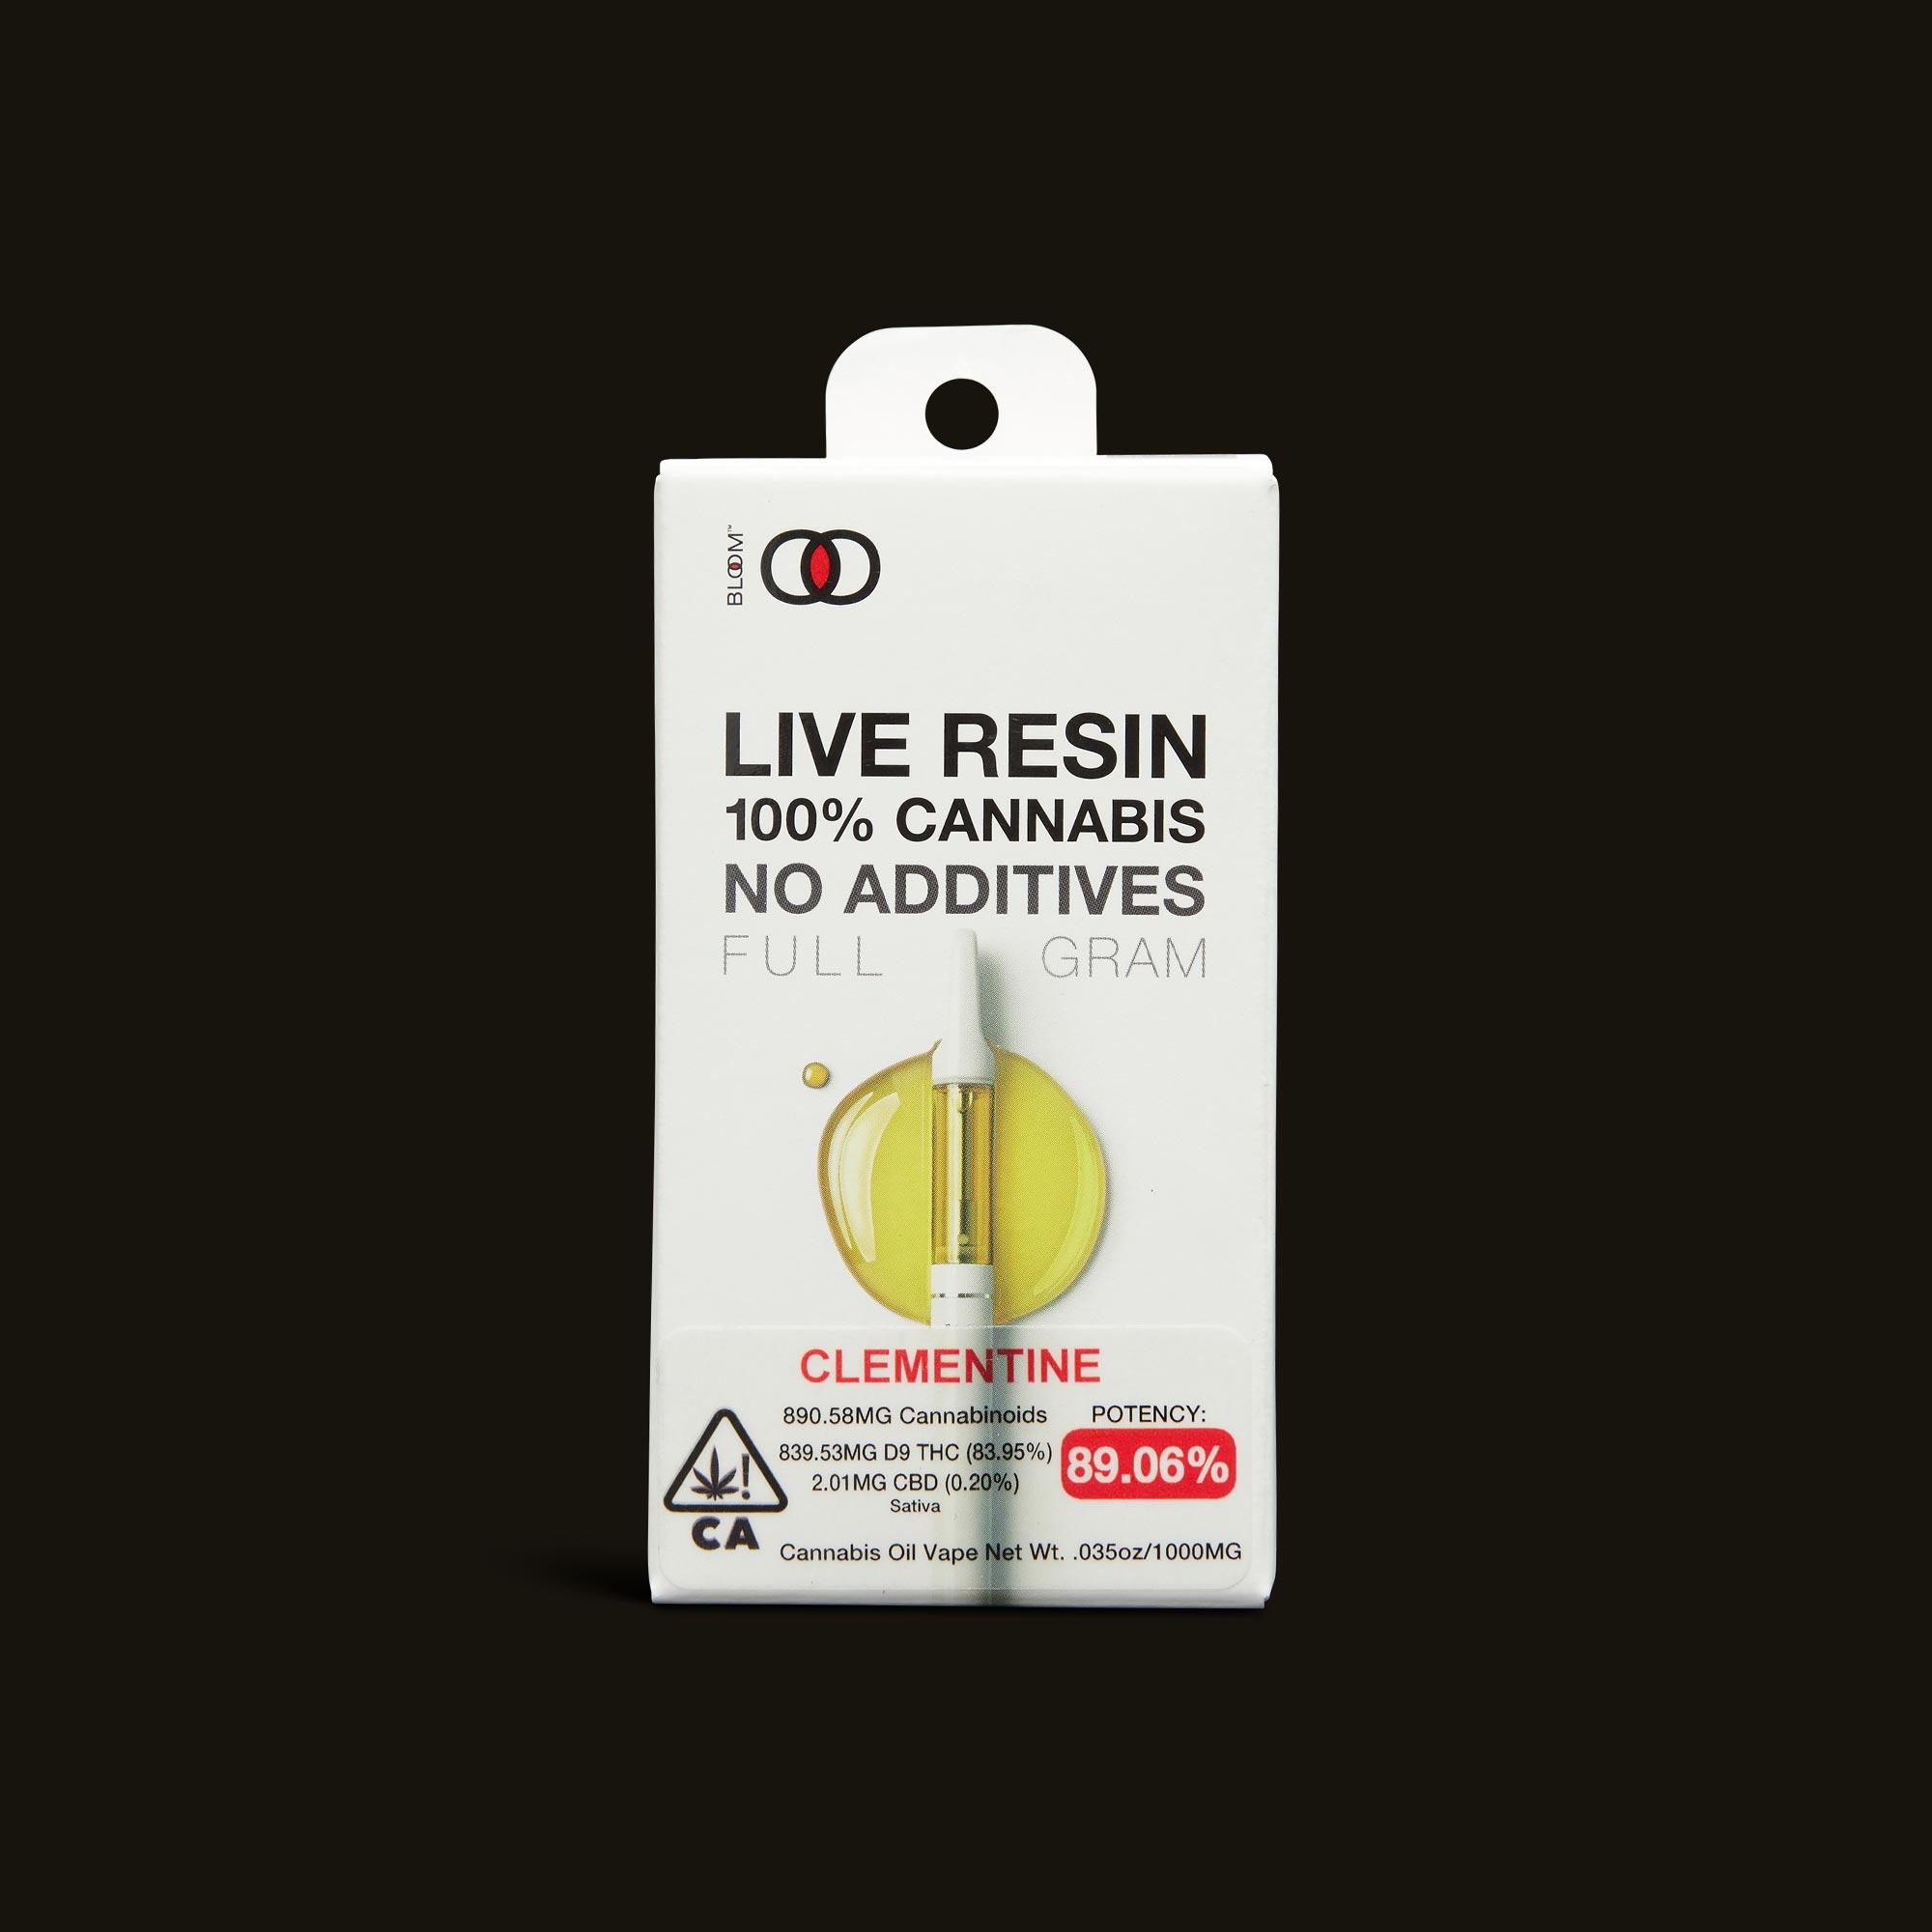 Clementine Live Resin Cartridge - 1g - Tangie, Lemon Skunk